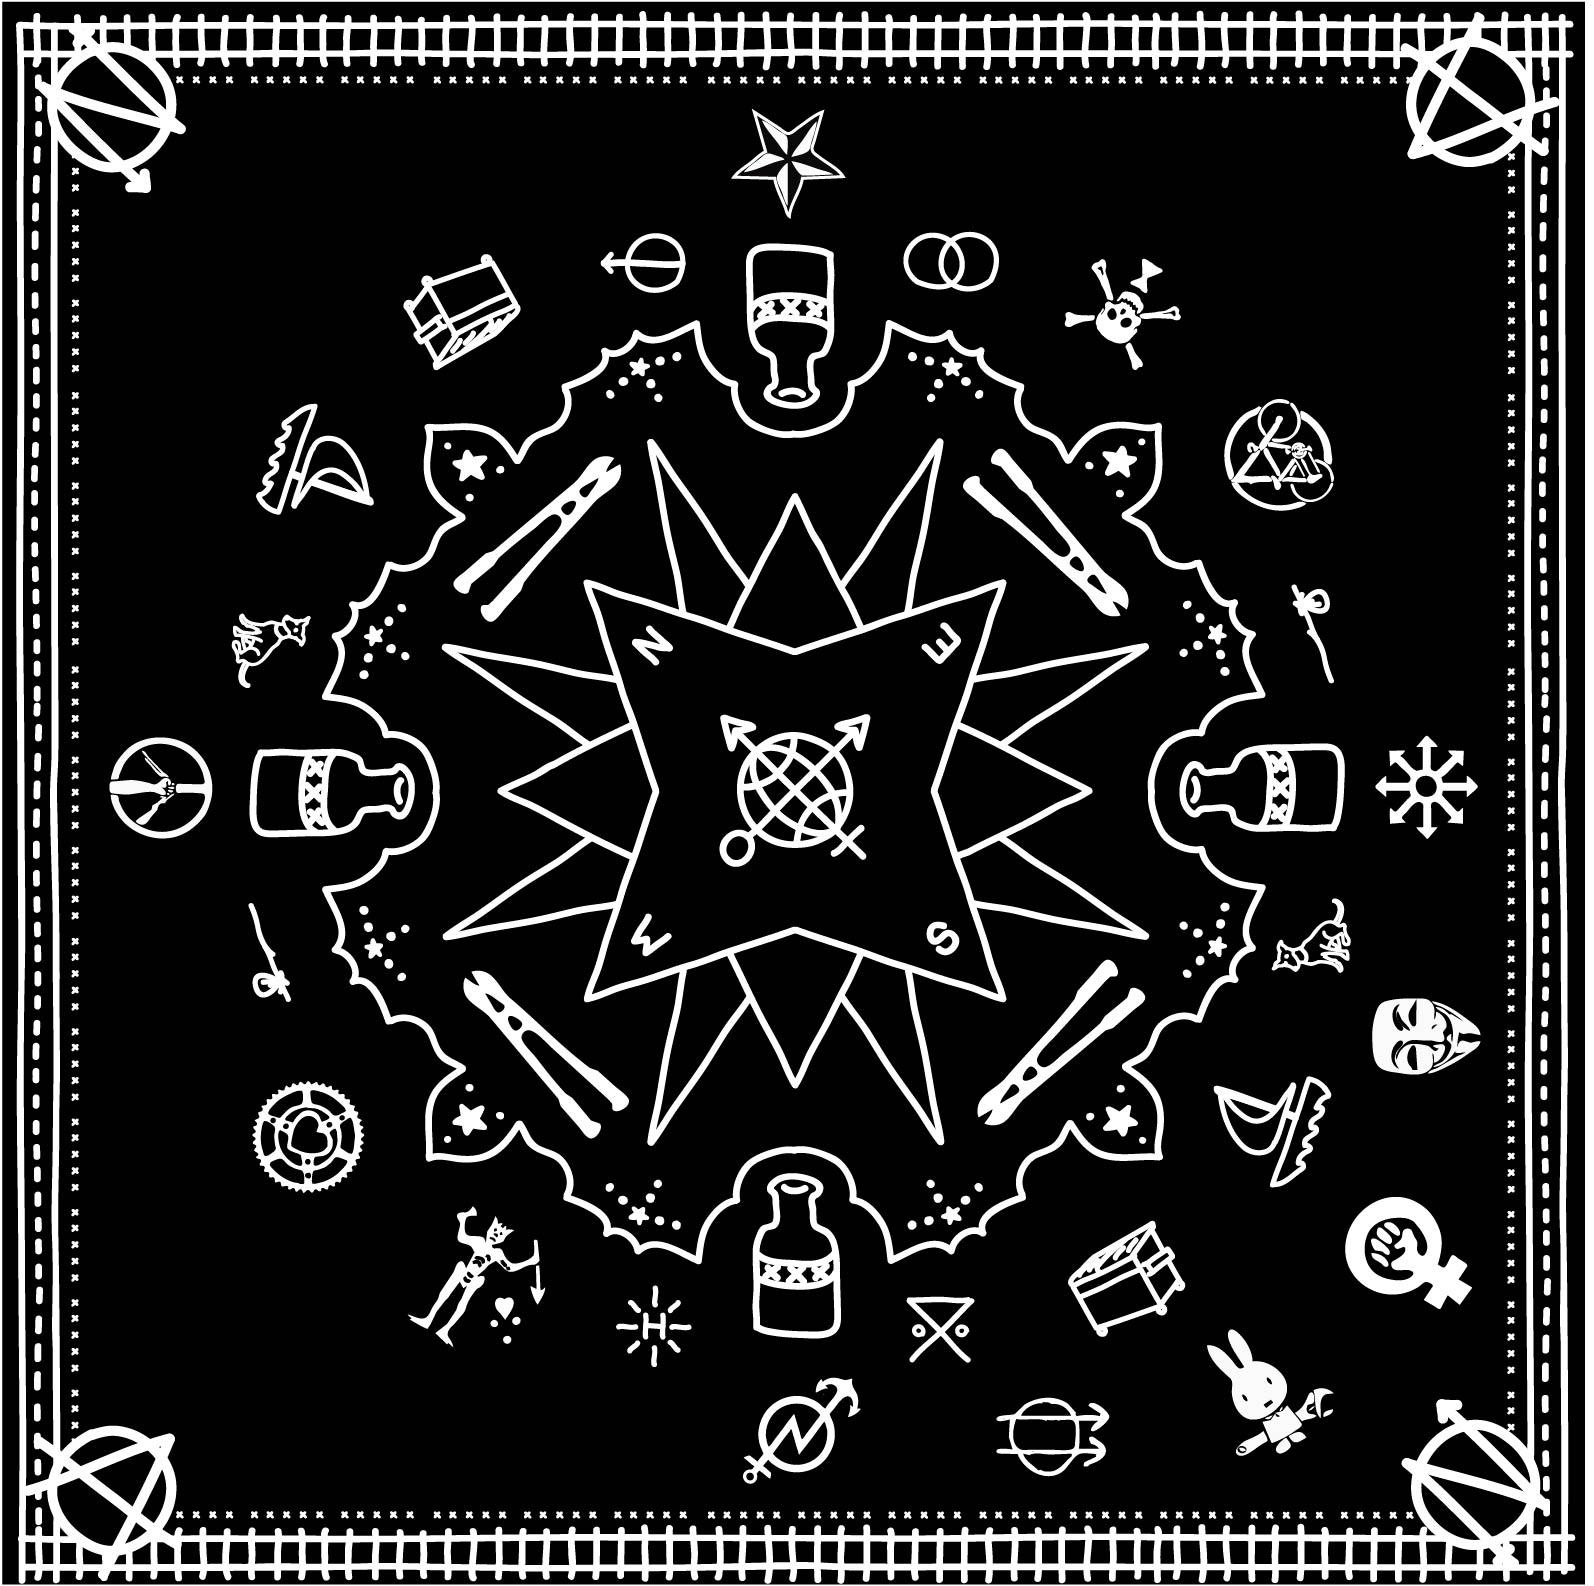 bandkerchief_stpv2-jpg.jpg